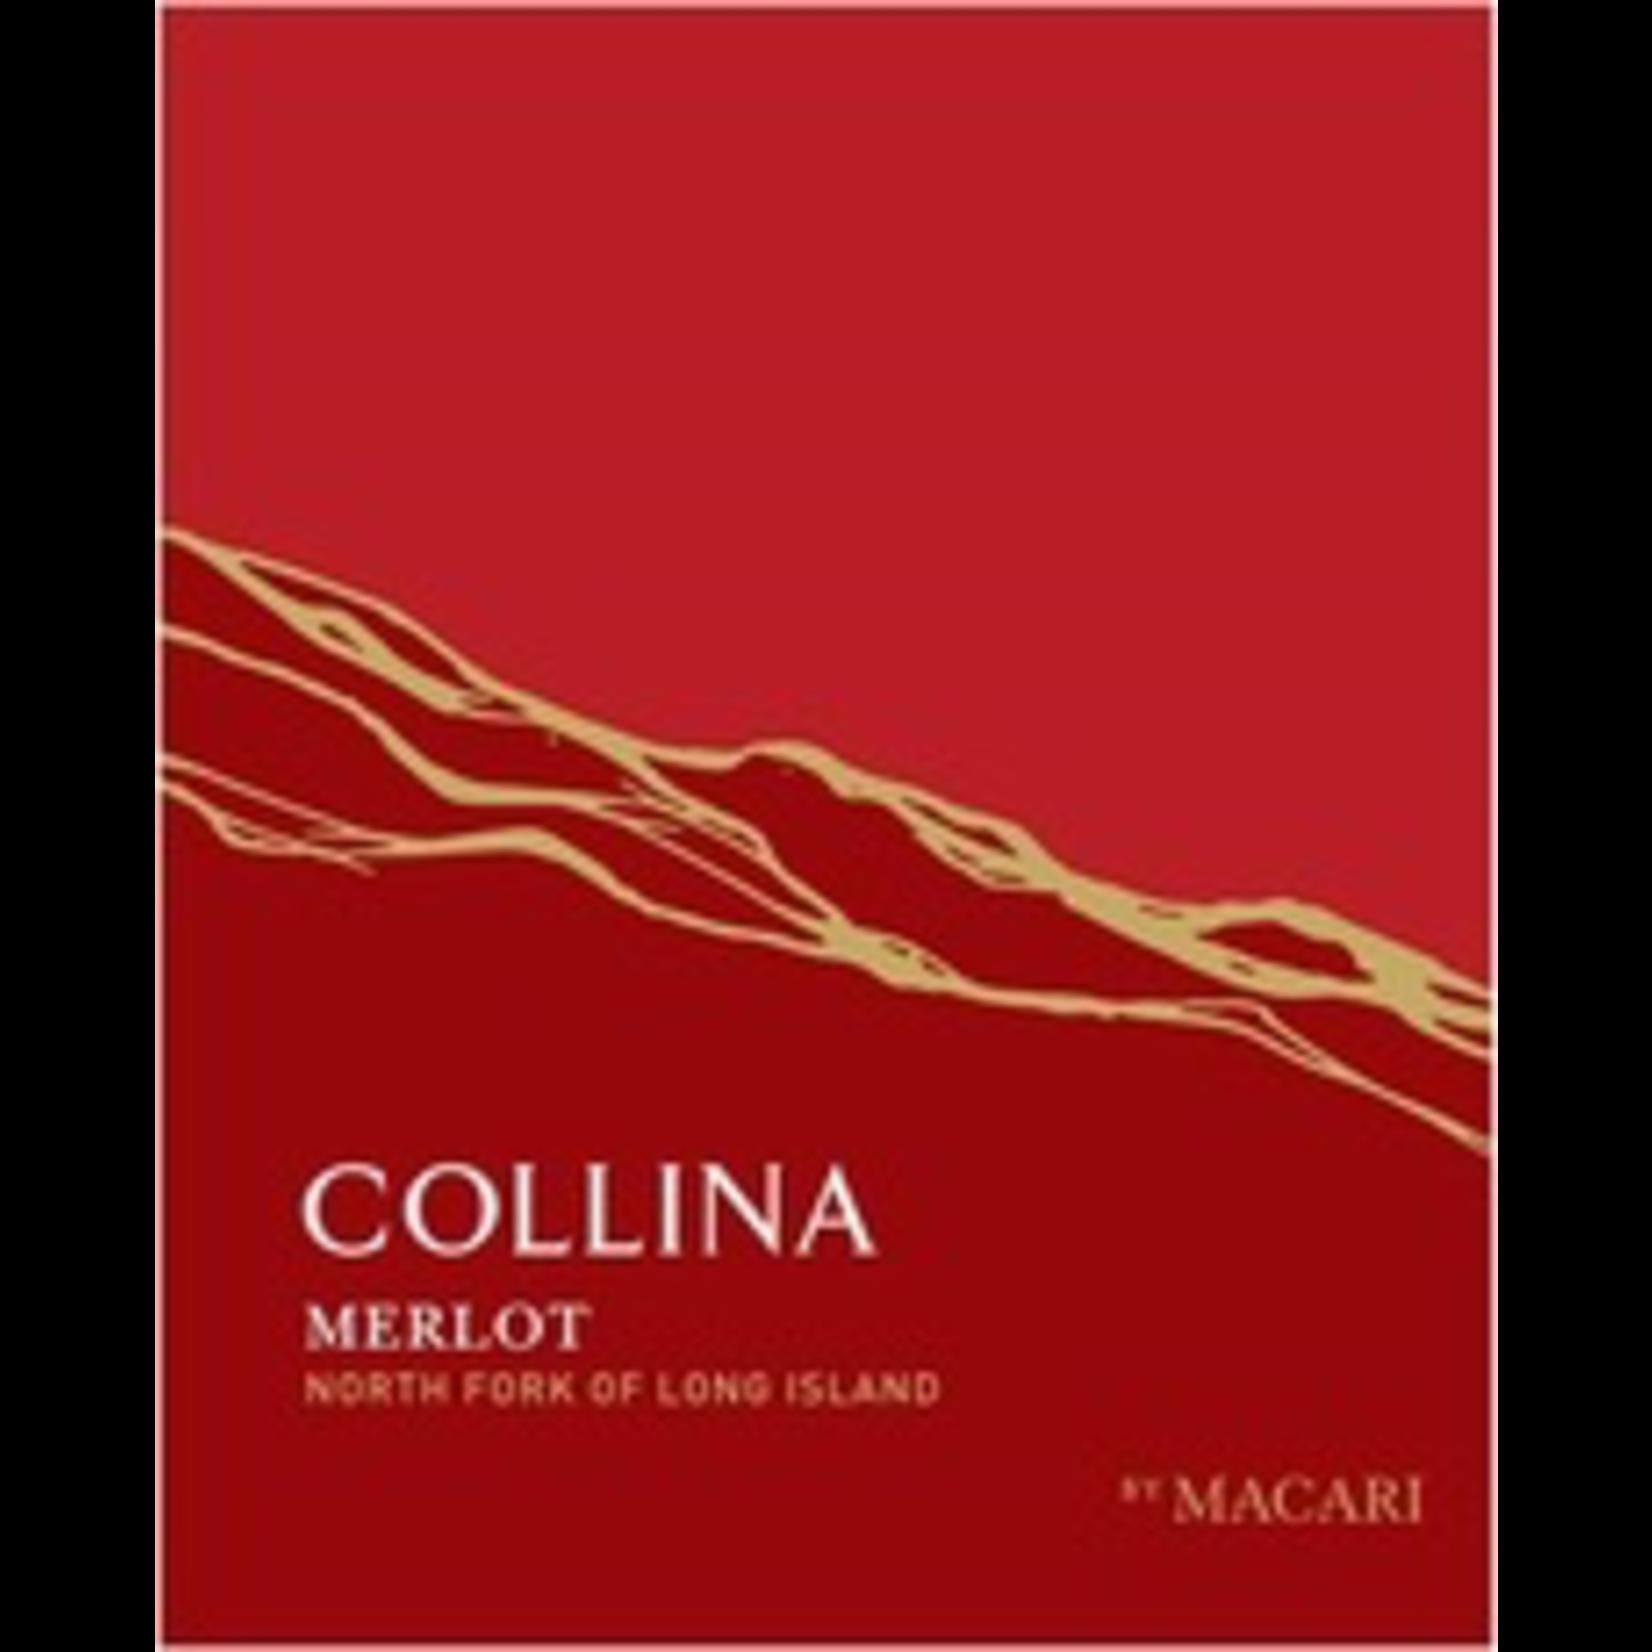 Macari Vineyards Merlot Collina North Fork of Long Island